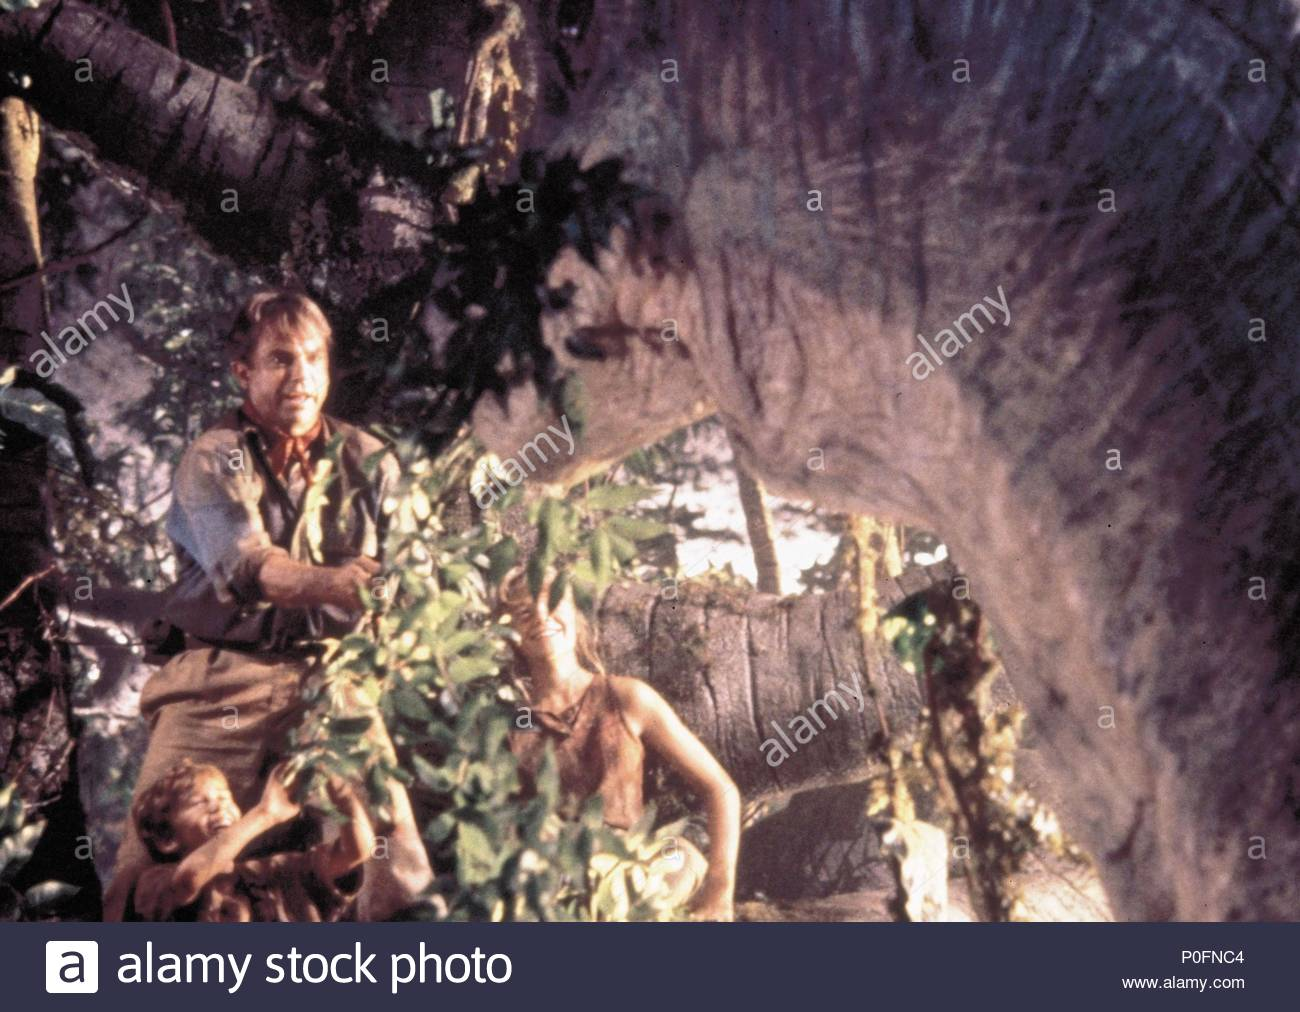 Original Film Title: JURASSIC PARK.  English Title: JURASSIC PARK.  Film Director: STEVEN SPIELBERG.  Year: 1993.  Stars: SAM NEILL. Credit: AMBLIN/UNIVERSAL / Album - Stock Image